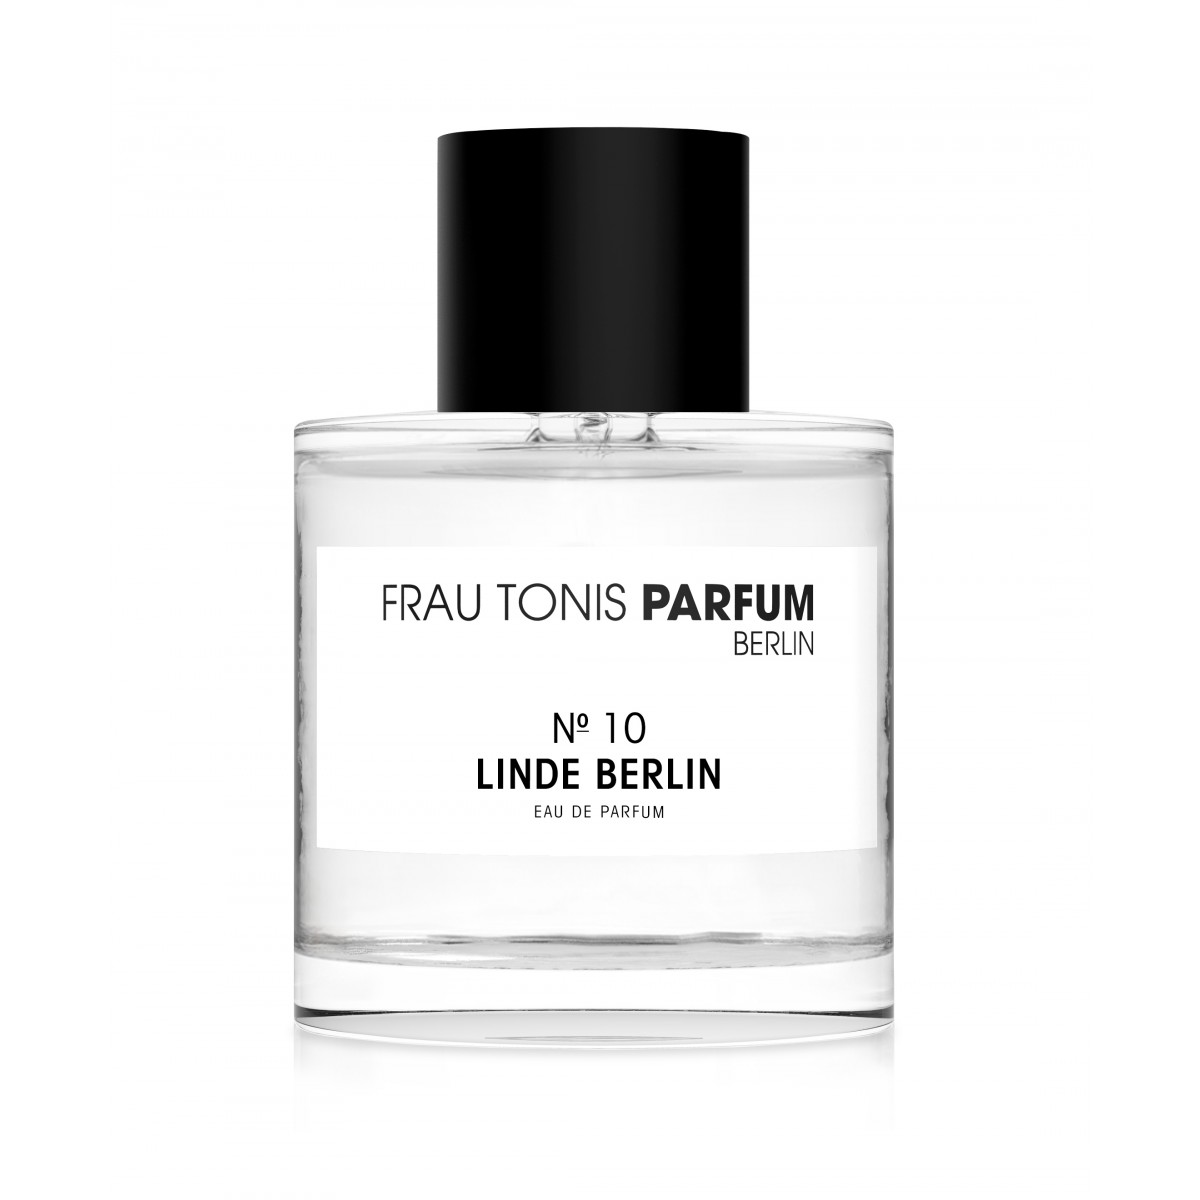 No.10 Linde Berlin | Eau de Parfum (50ml)